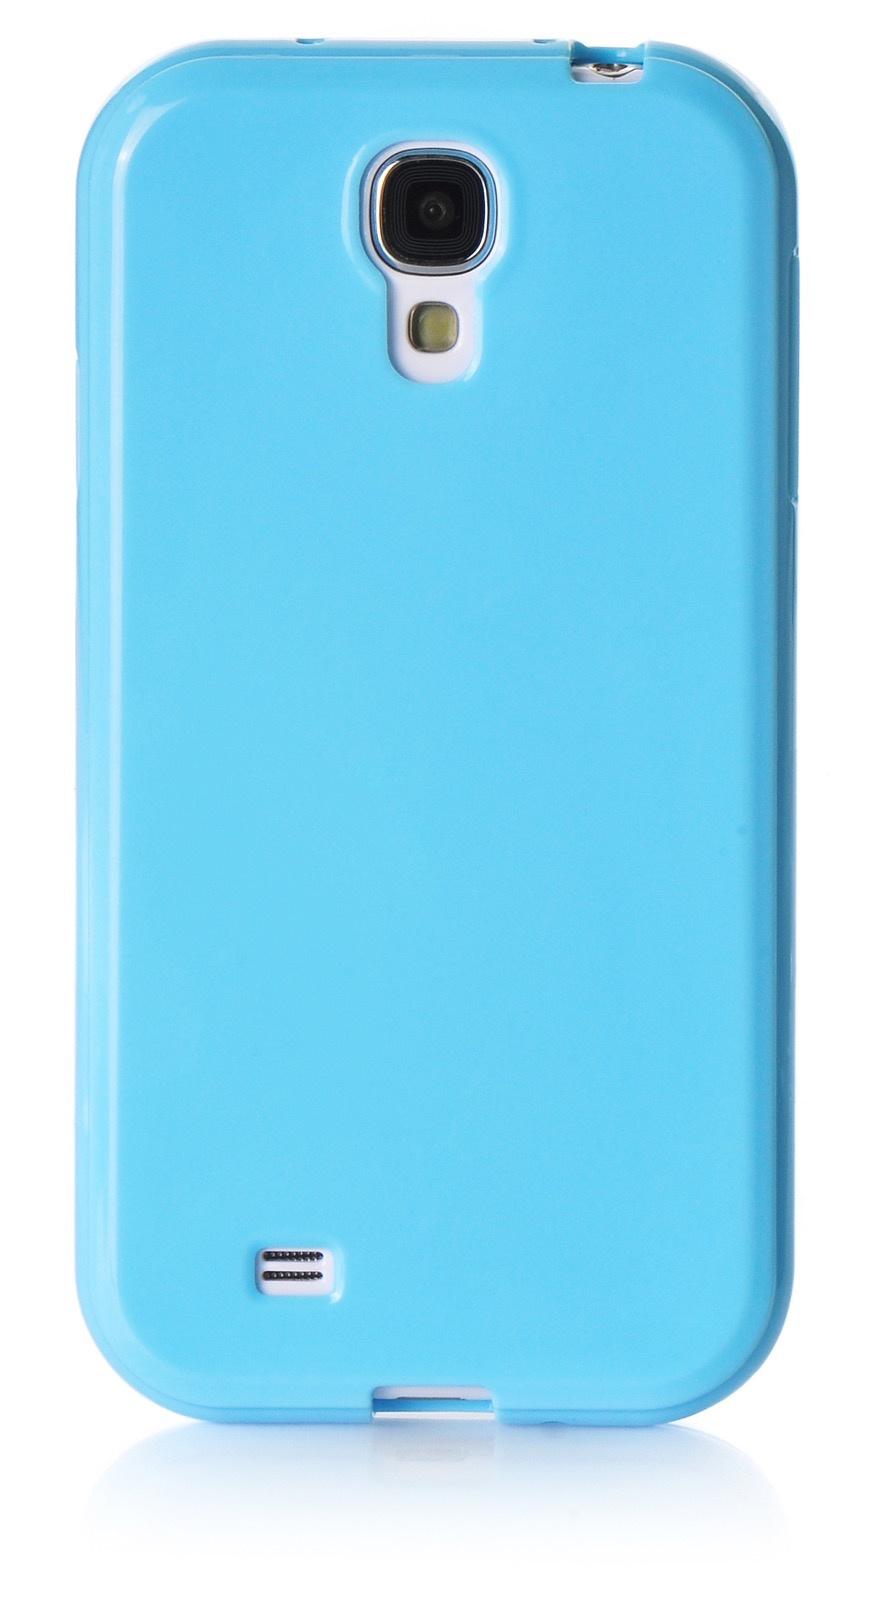 Чехол для сотового телефона iNeez накладка силикон мыльница 480078 для Samsung Galaxy S4 mini, голубой